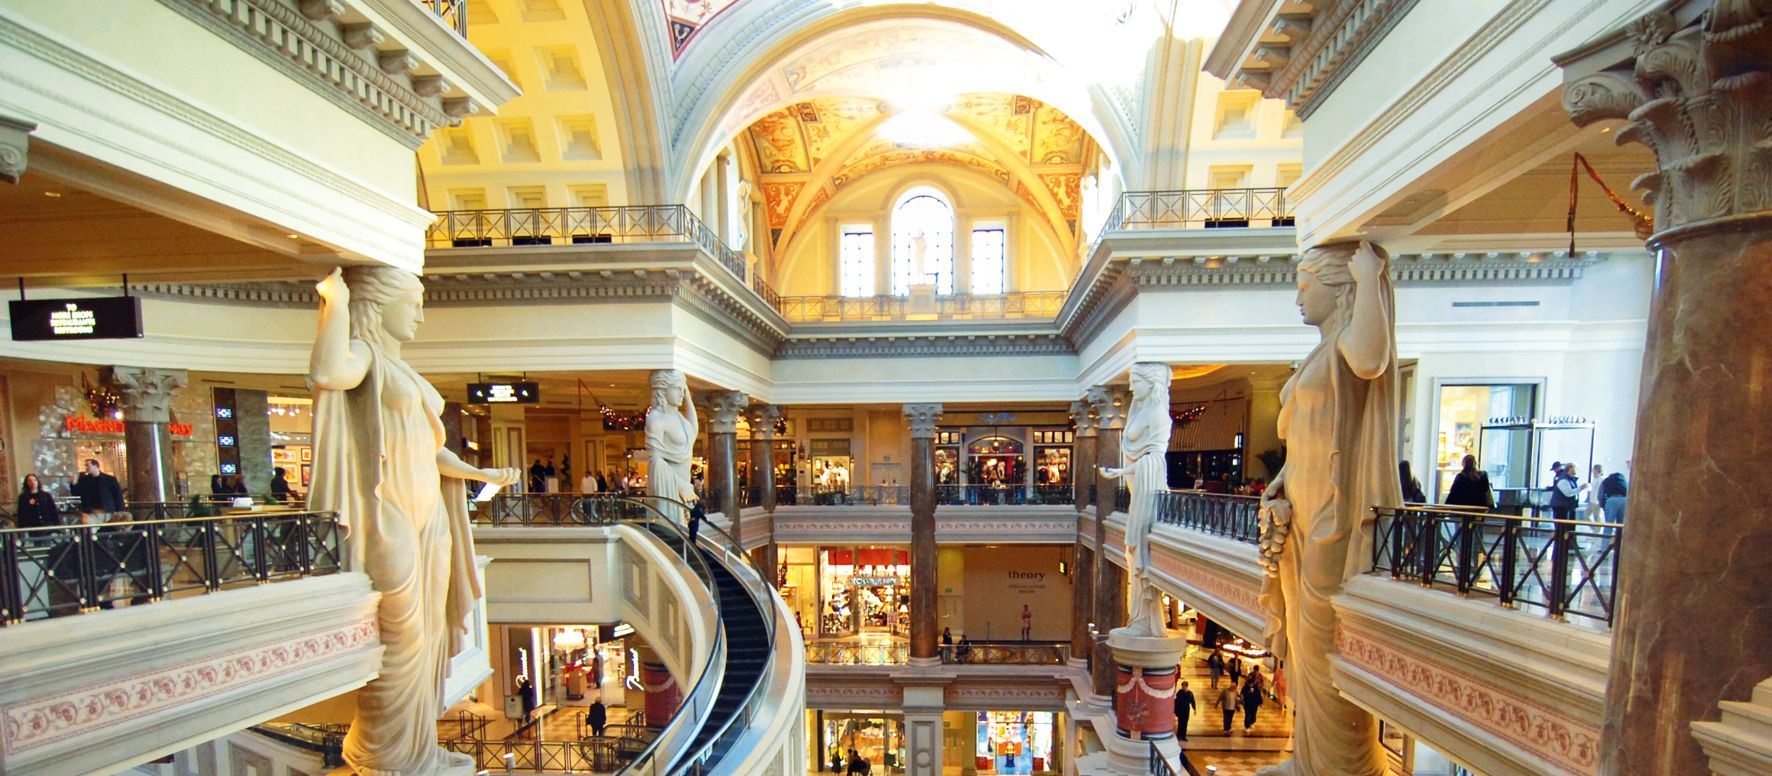 Caesars Forum Shopping. 11/28/05